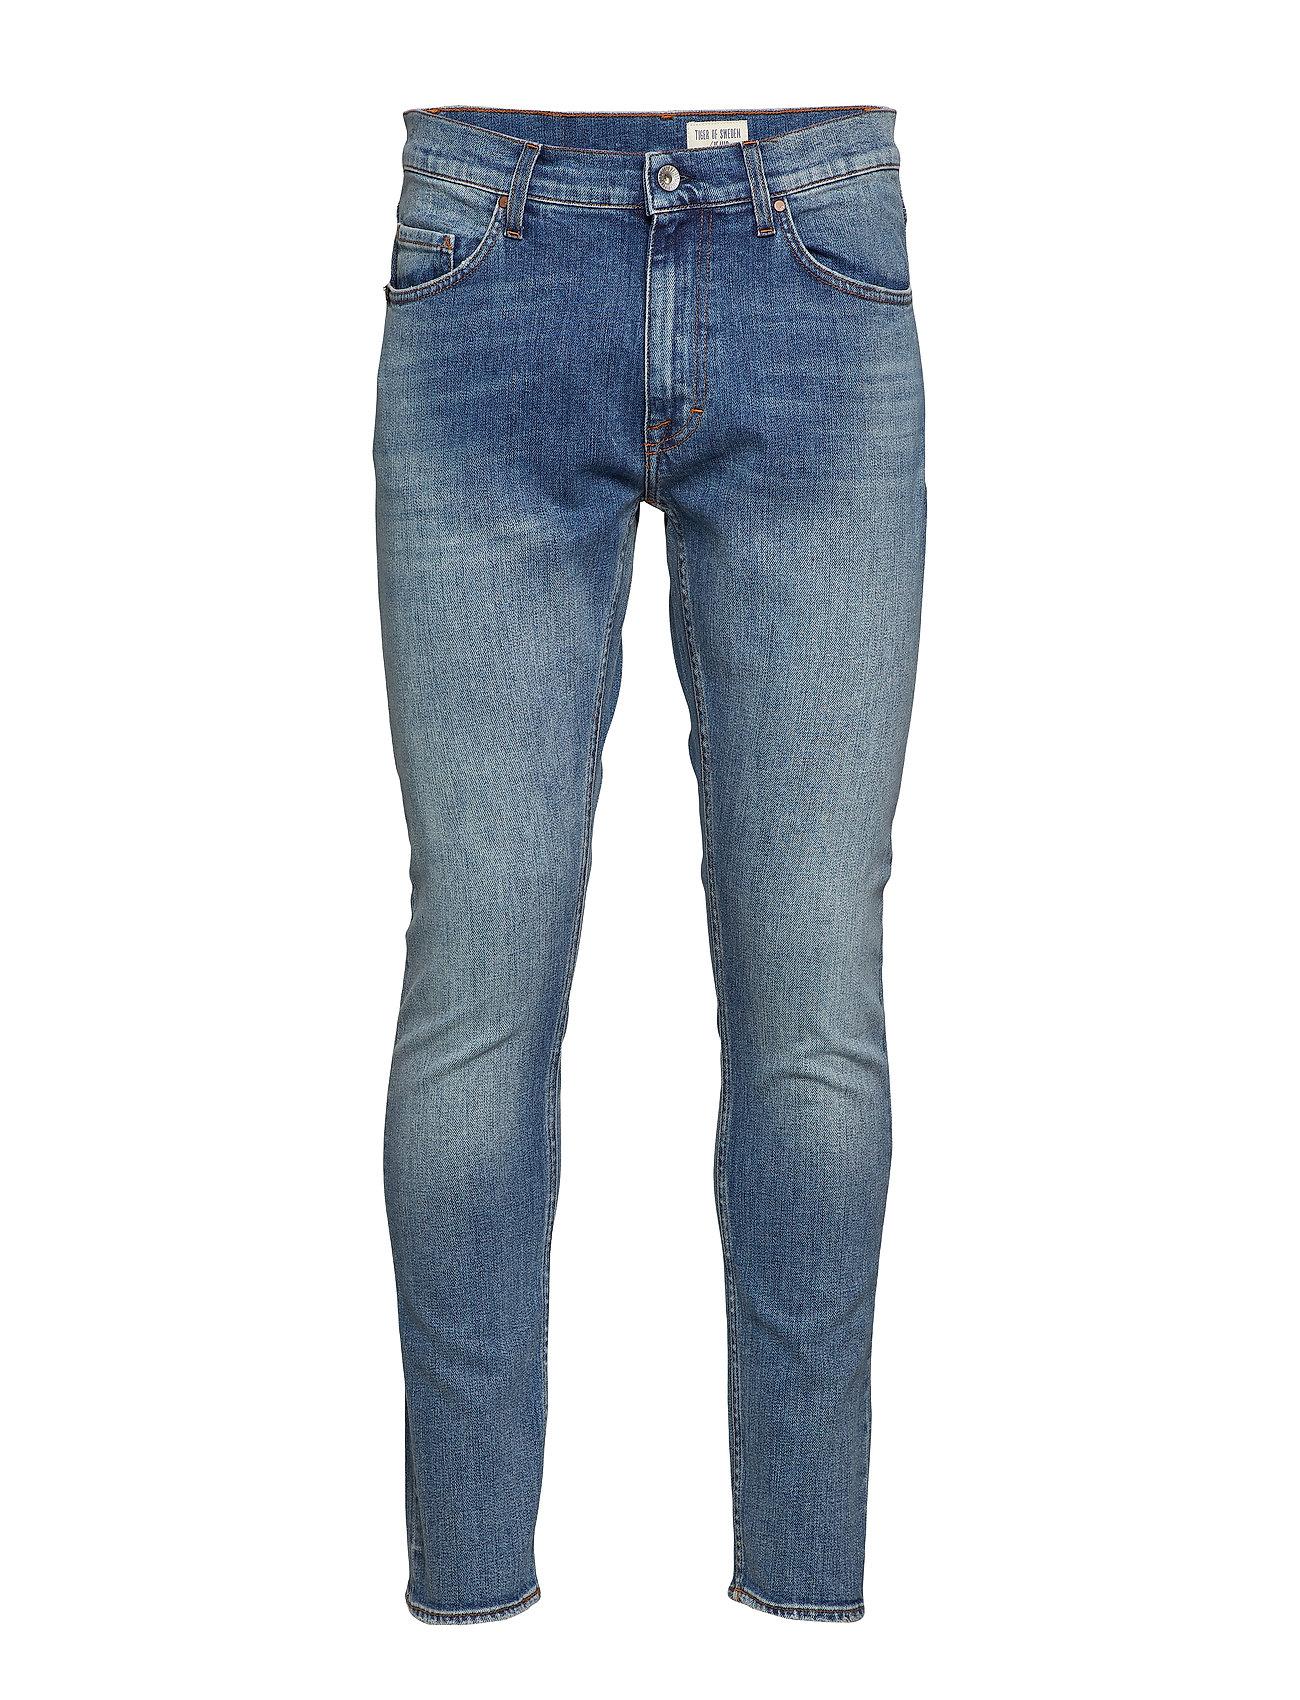 Tiger of Sweden Jeans PISTOLERO - DUST BLUE